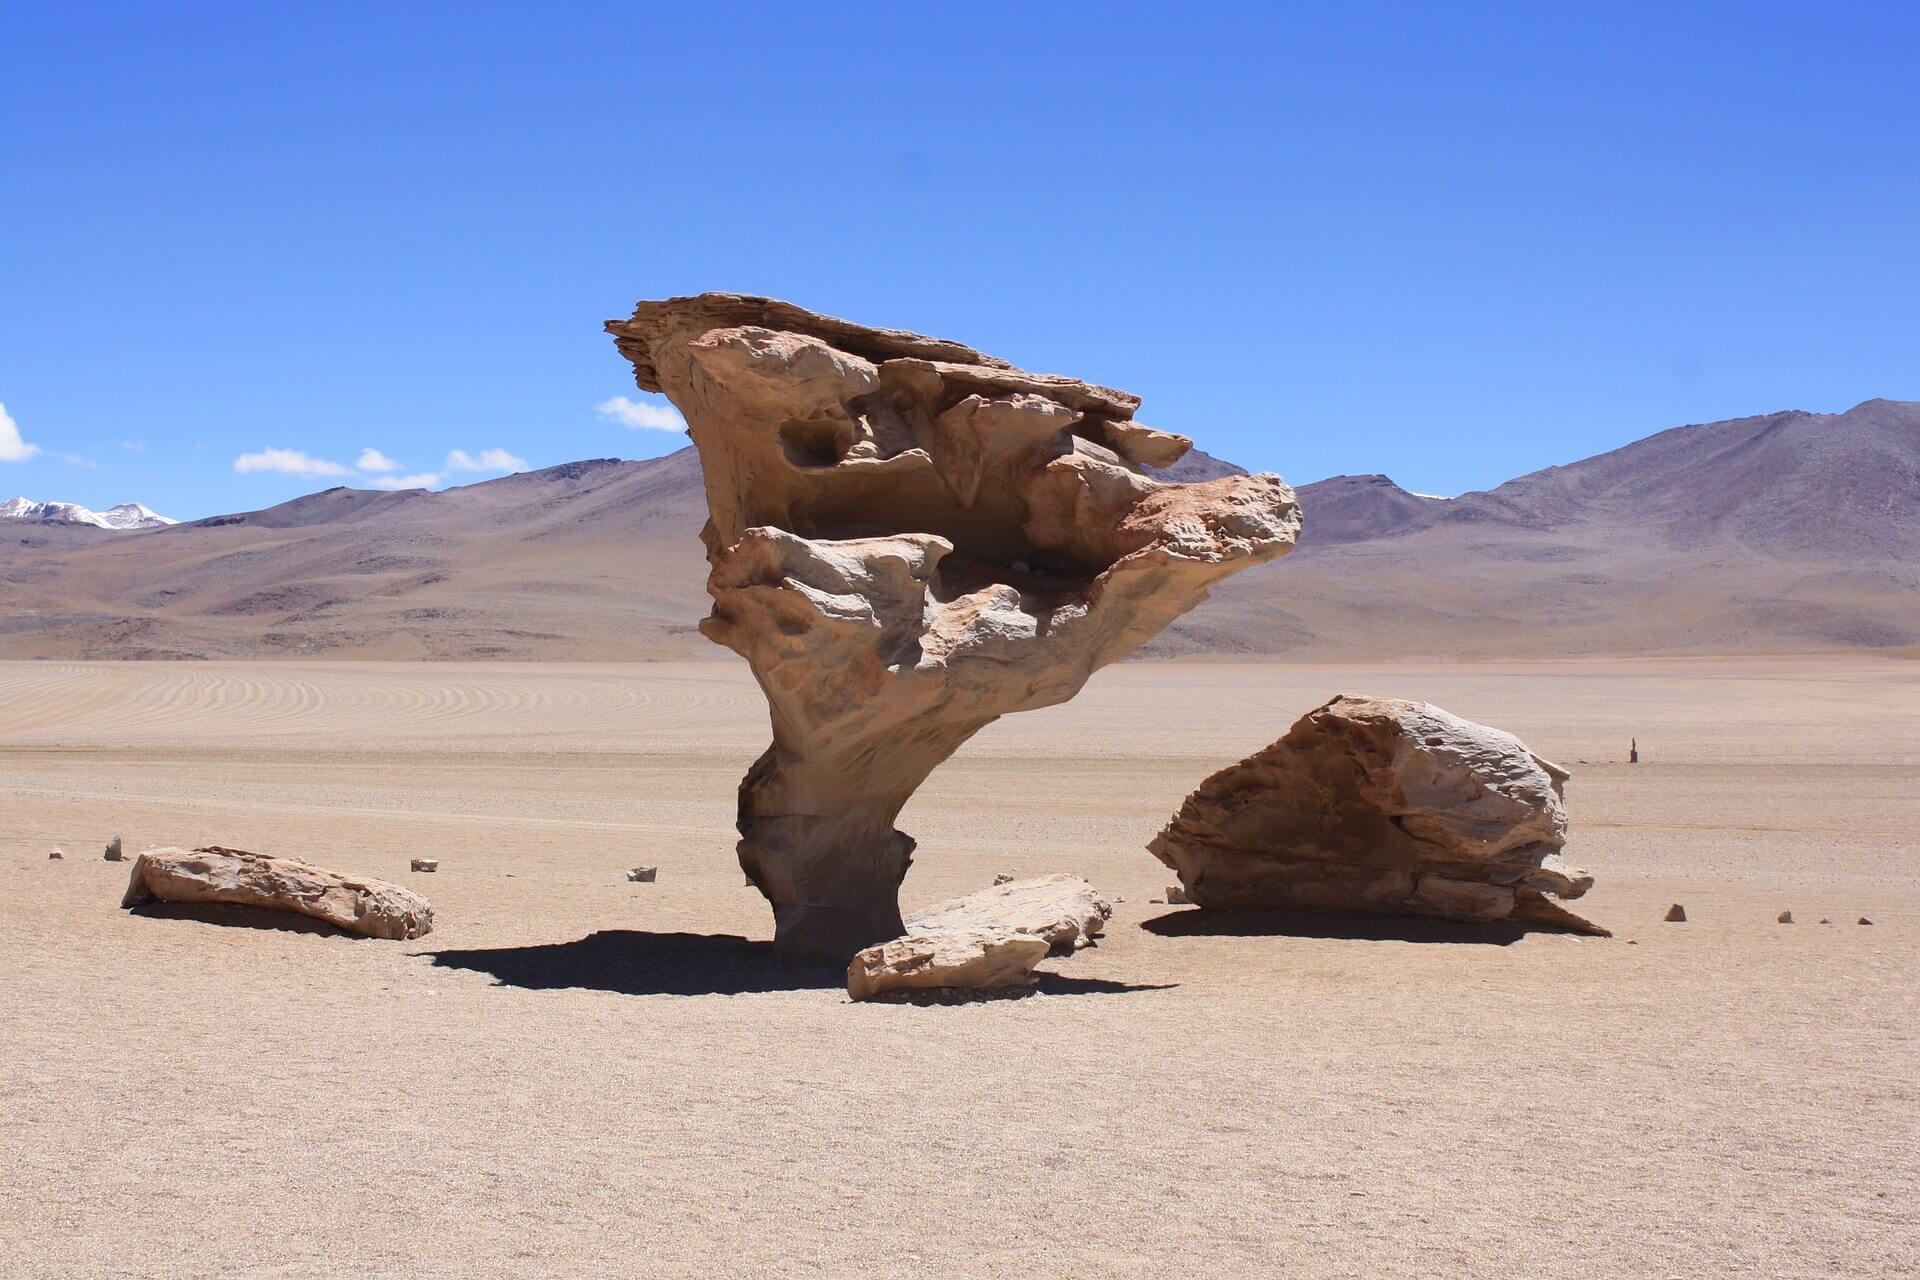 Stenen boom in de Salvador Dali woestijn bij Uyuni in Bolivia